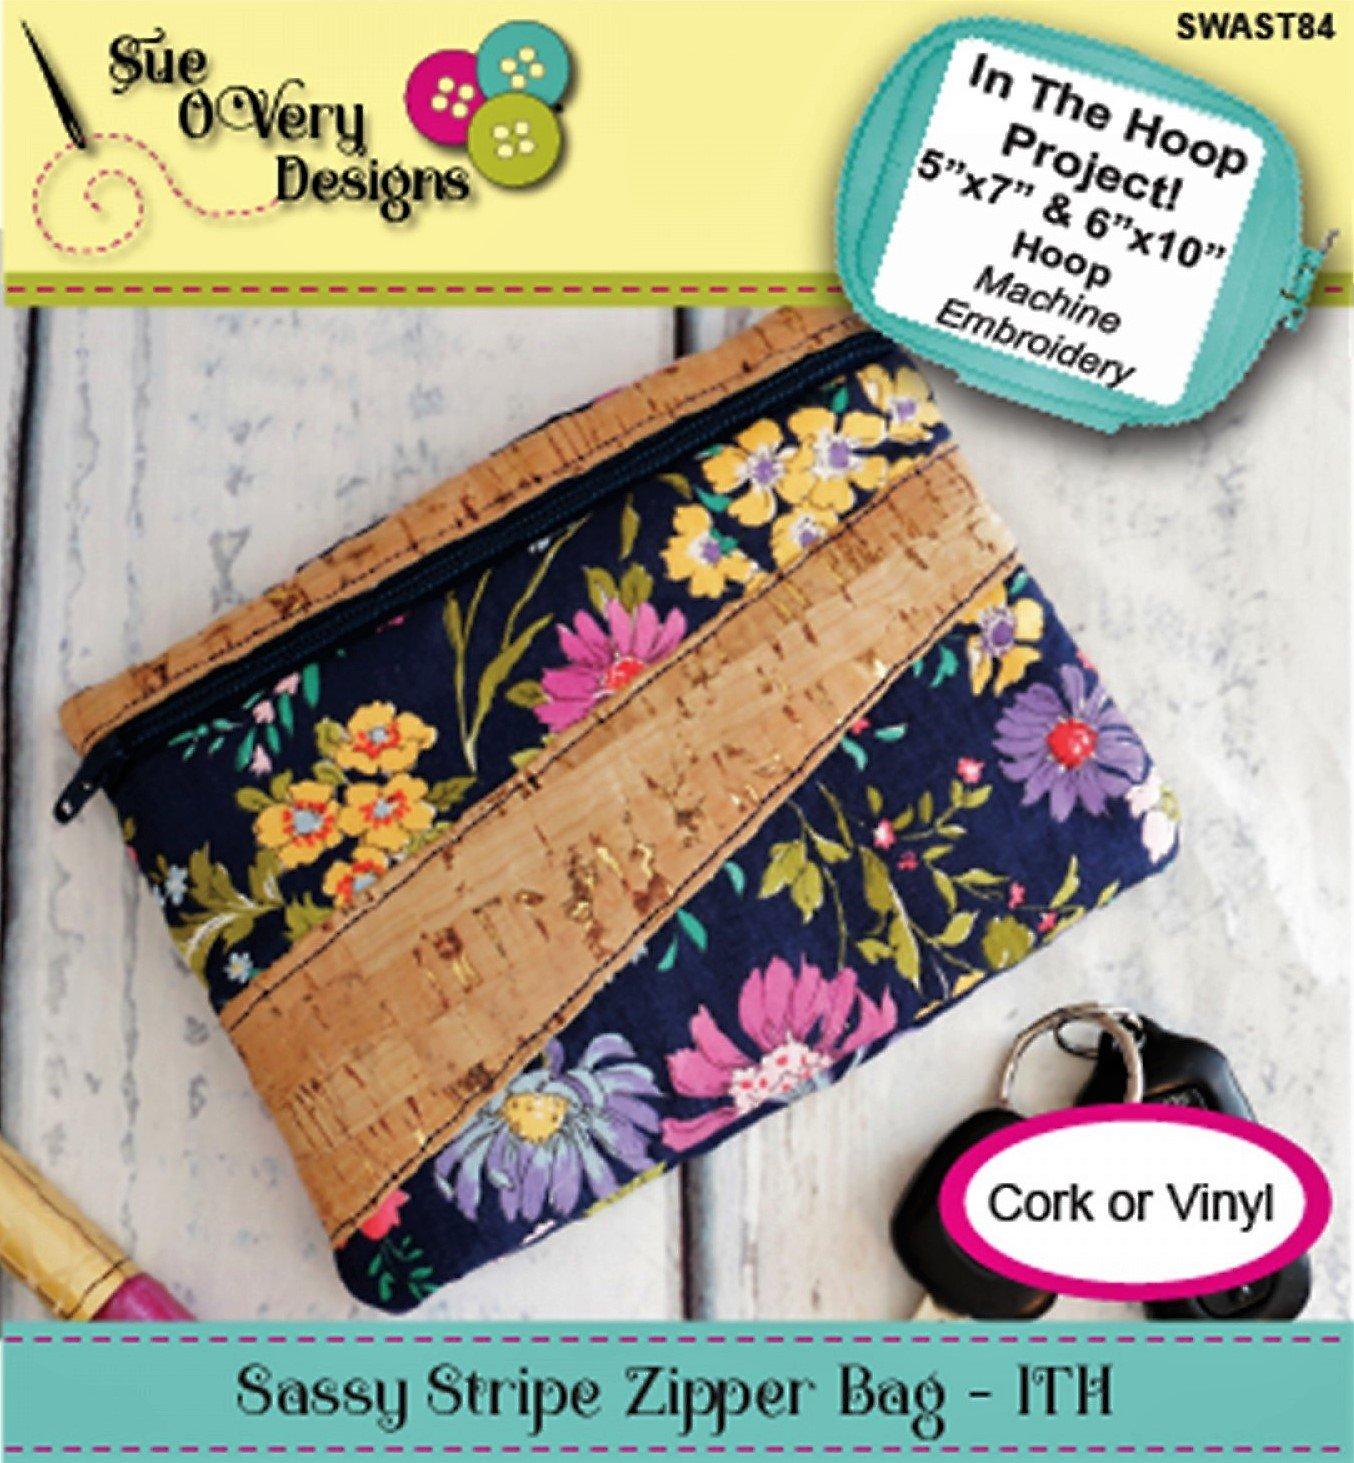 Sassy Stripe Zipper Bag